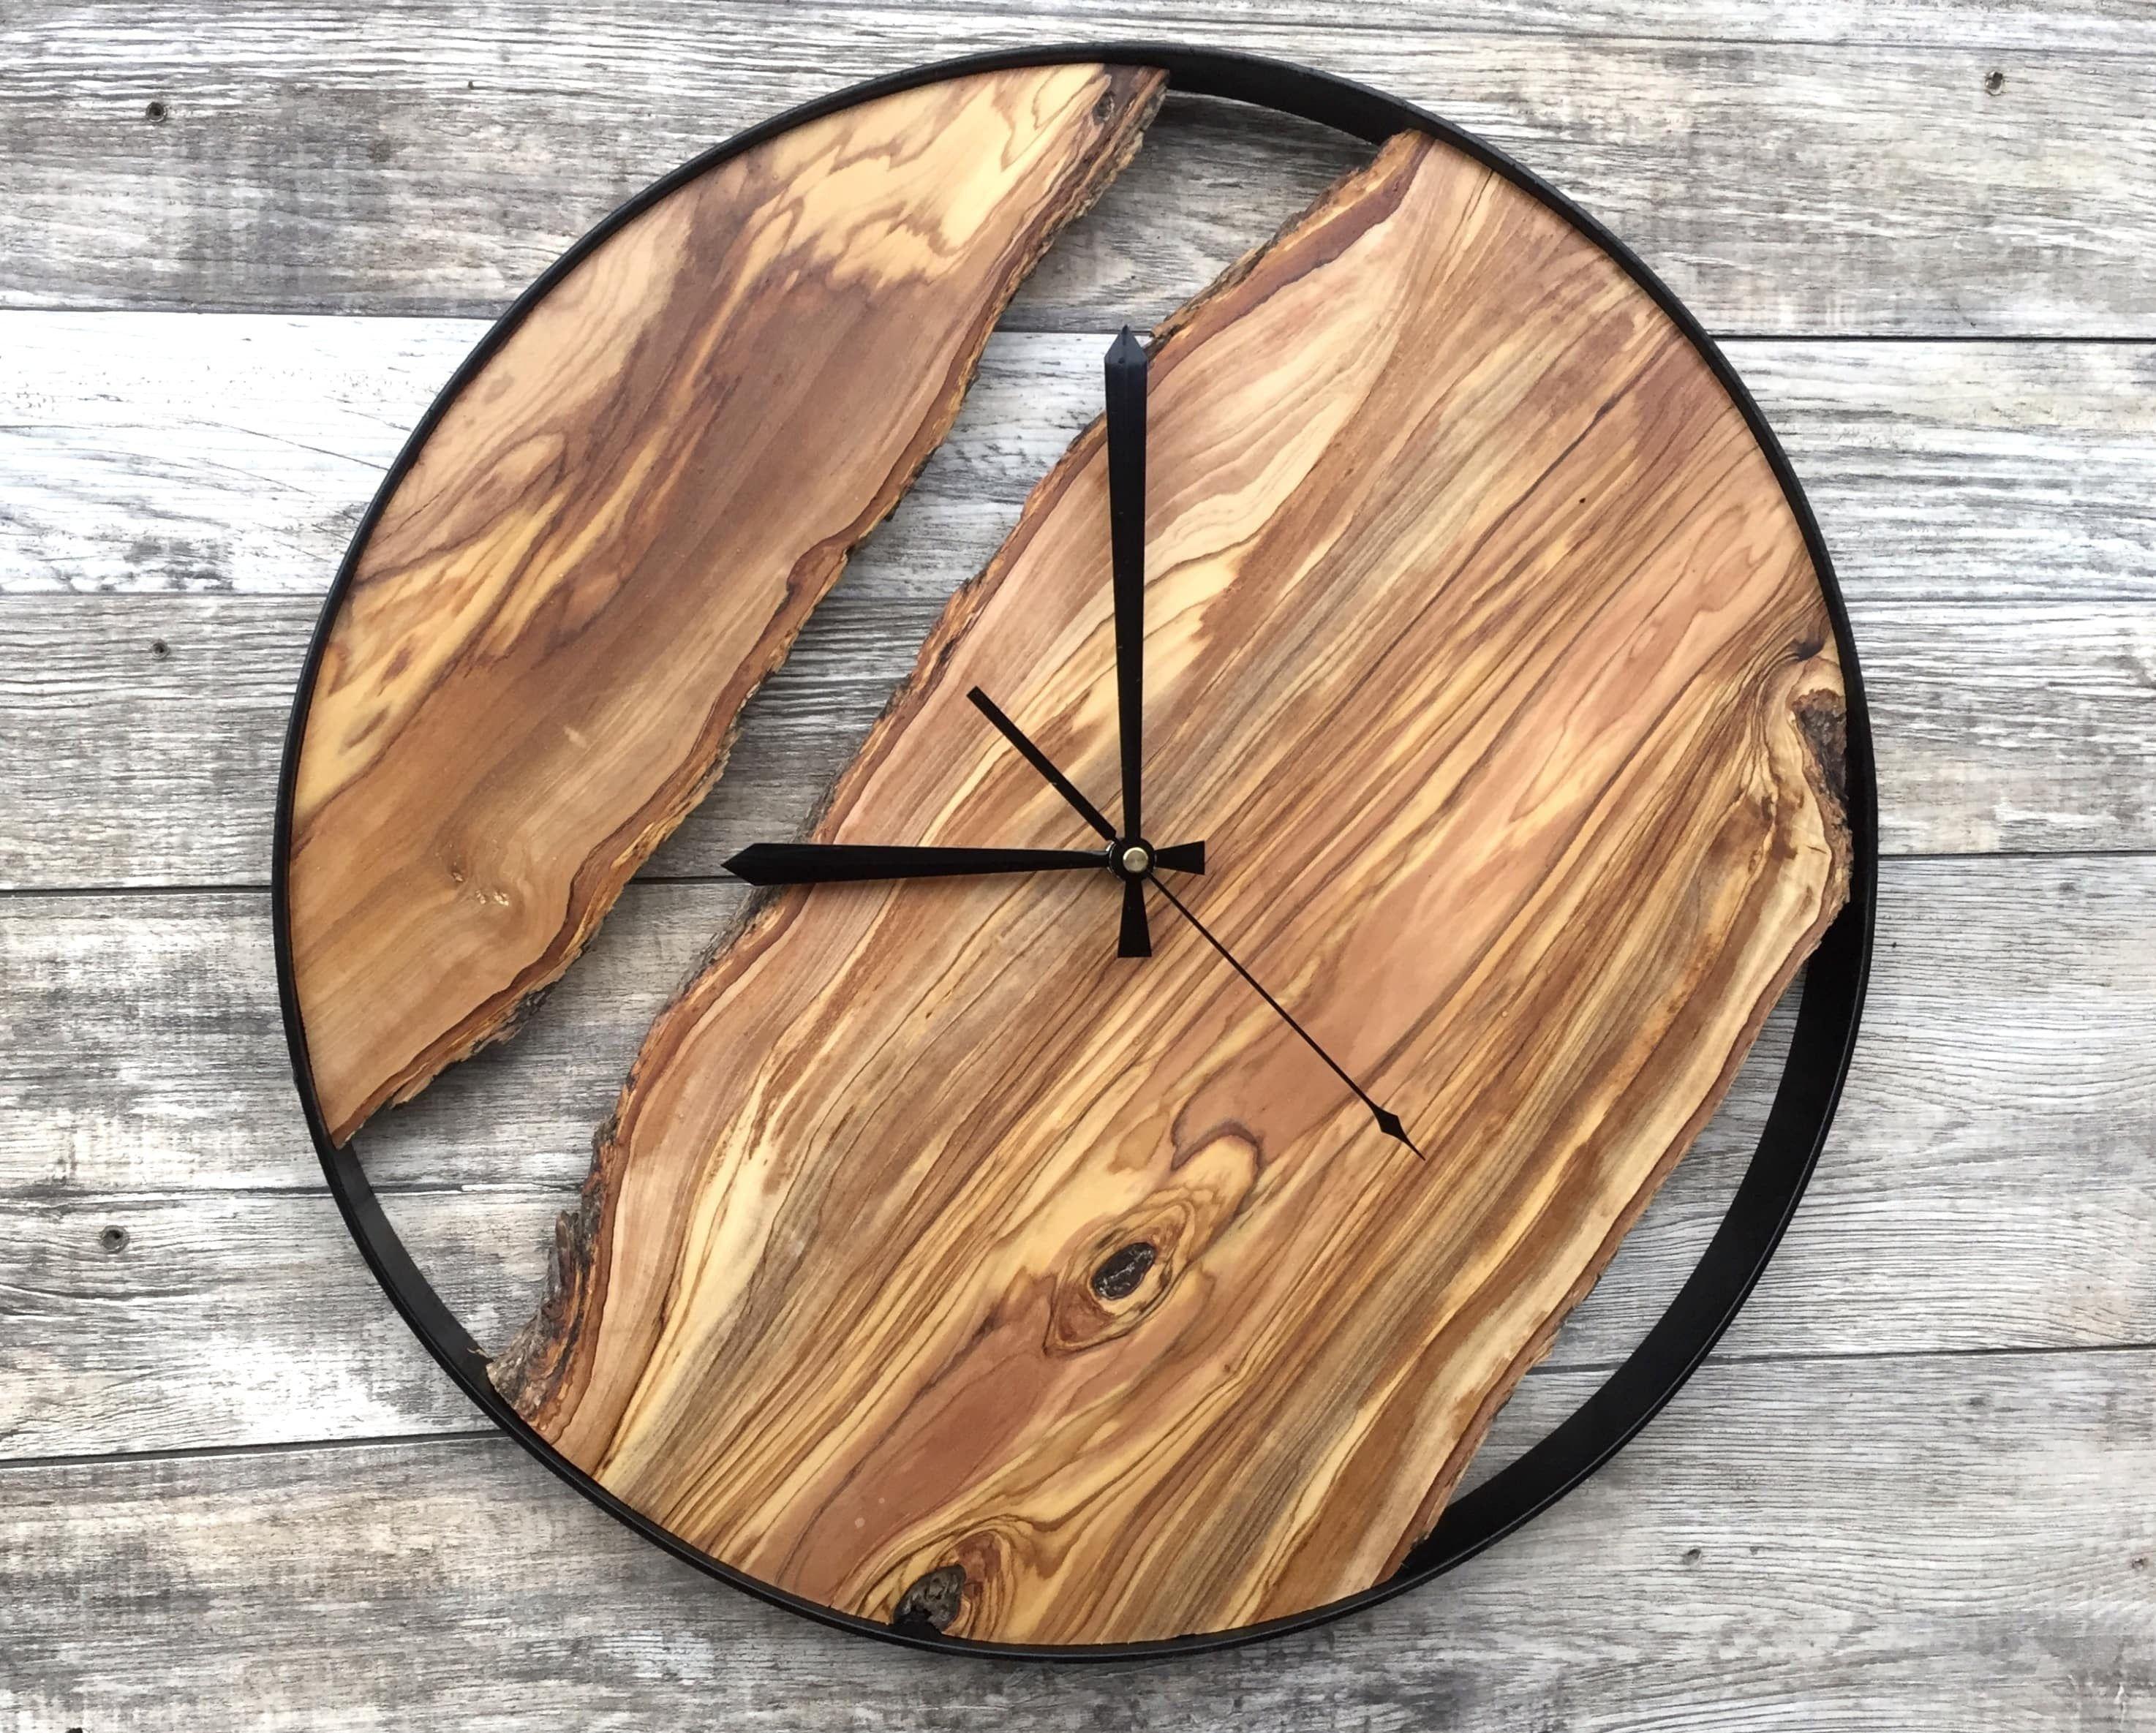 Large Wall Clocks Wood Slice Art Wooden Wall Clock Rustic Wood Wall Clock Large Wall Clock Tree Slice Clock Wood Natural Clock In 2020 Wood Wall Clock Rustic Wall Clocks Large